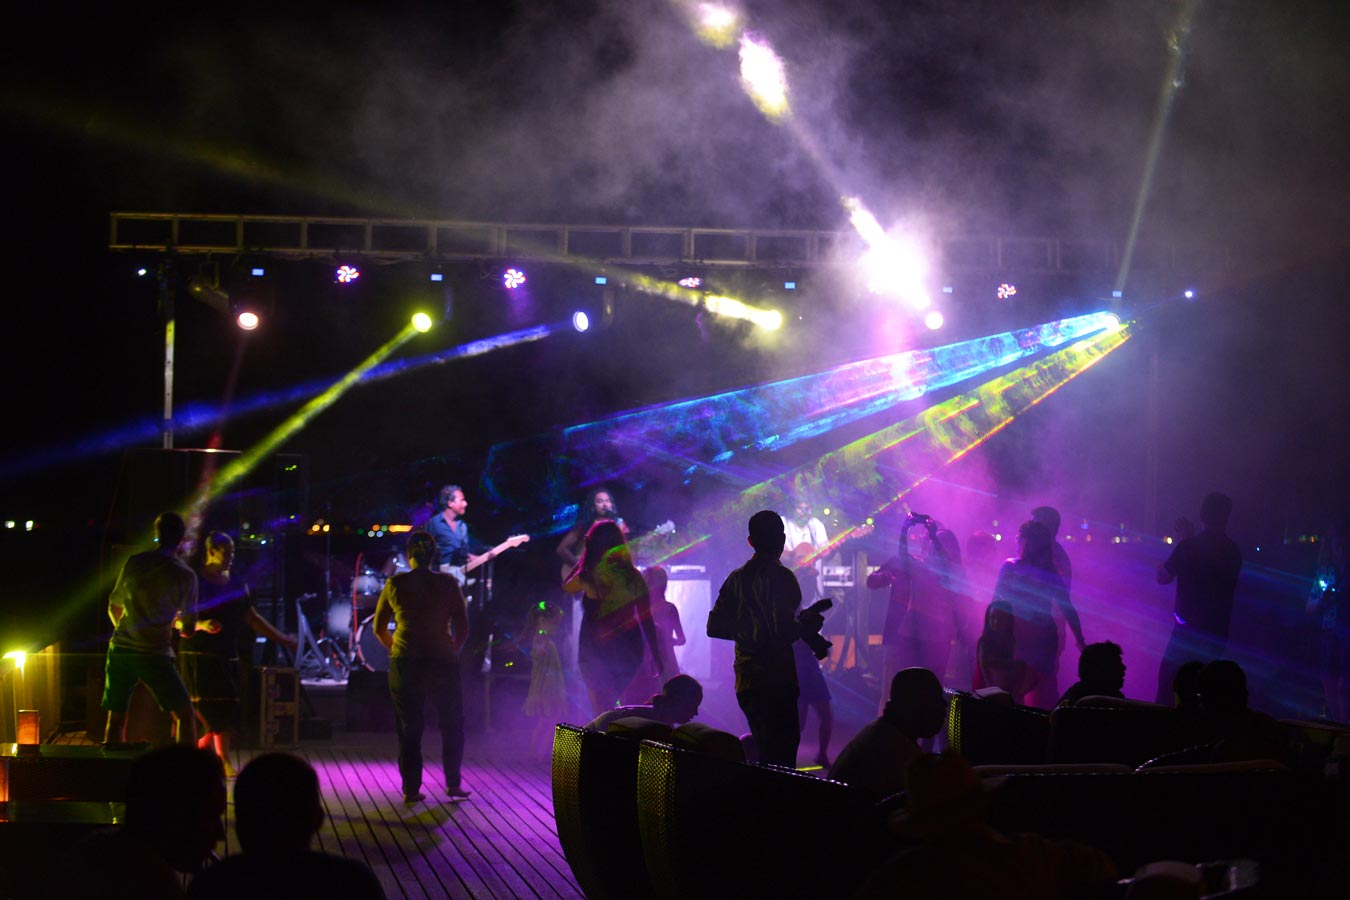 Kurumba Maldives Event Calendar DJ Party Image | Maldives Resorts